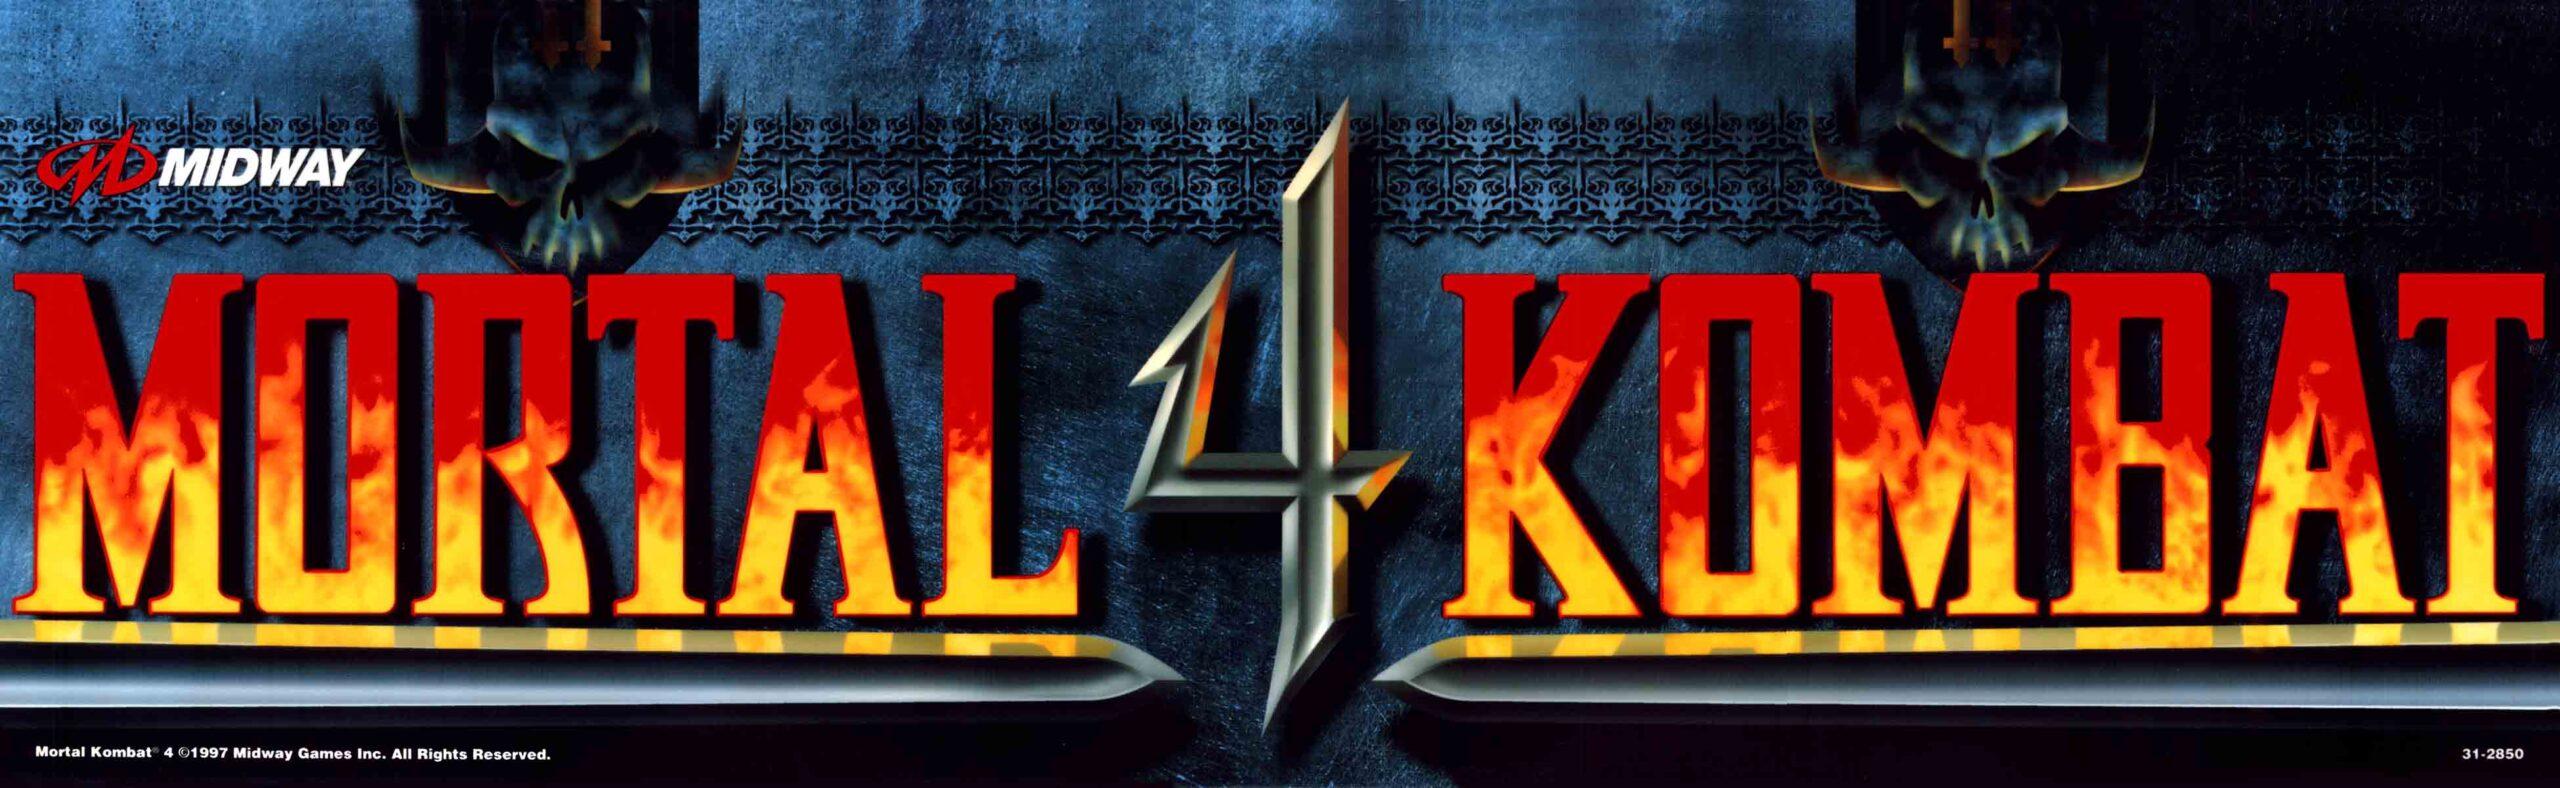 A World of Games: Mortal Kombat 4